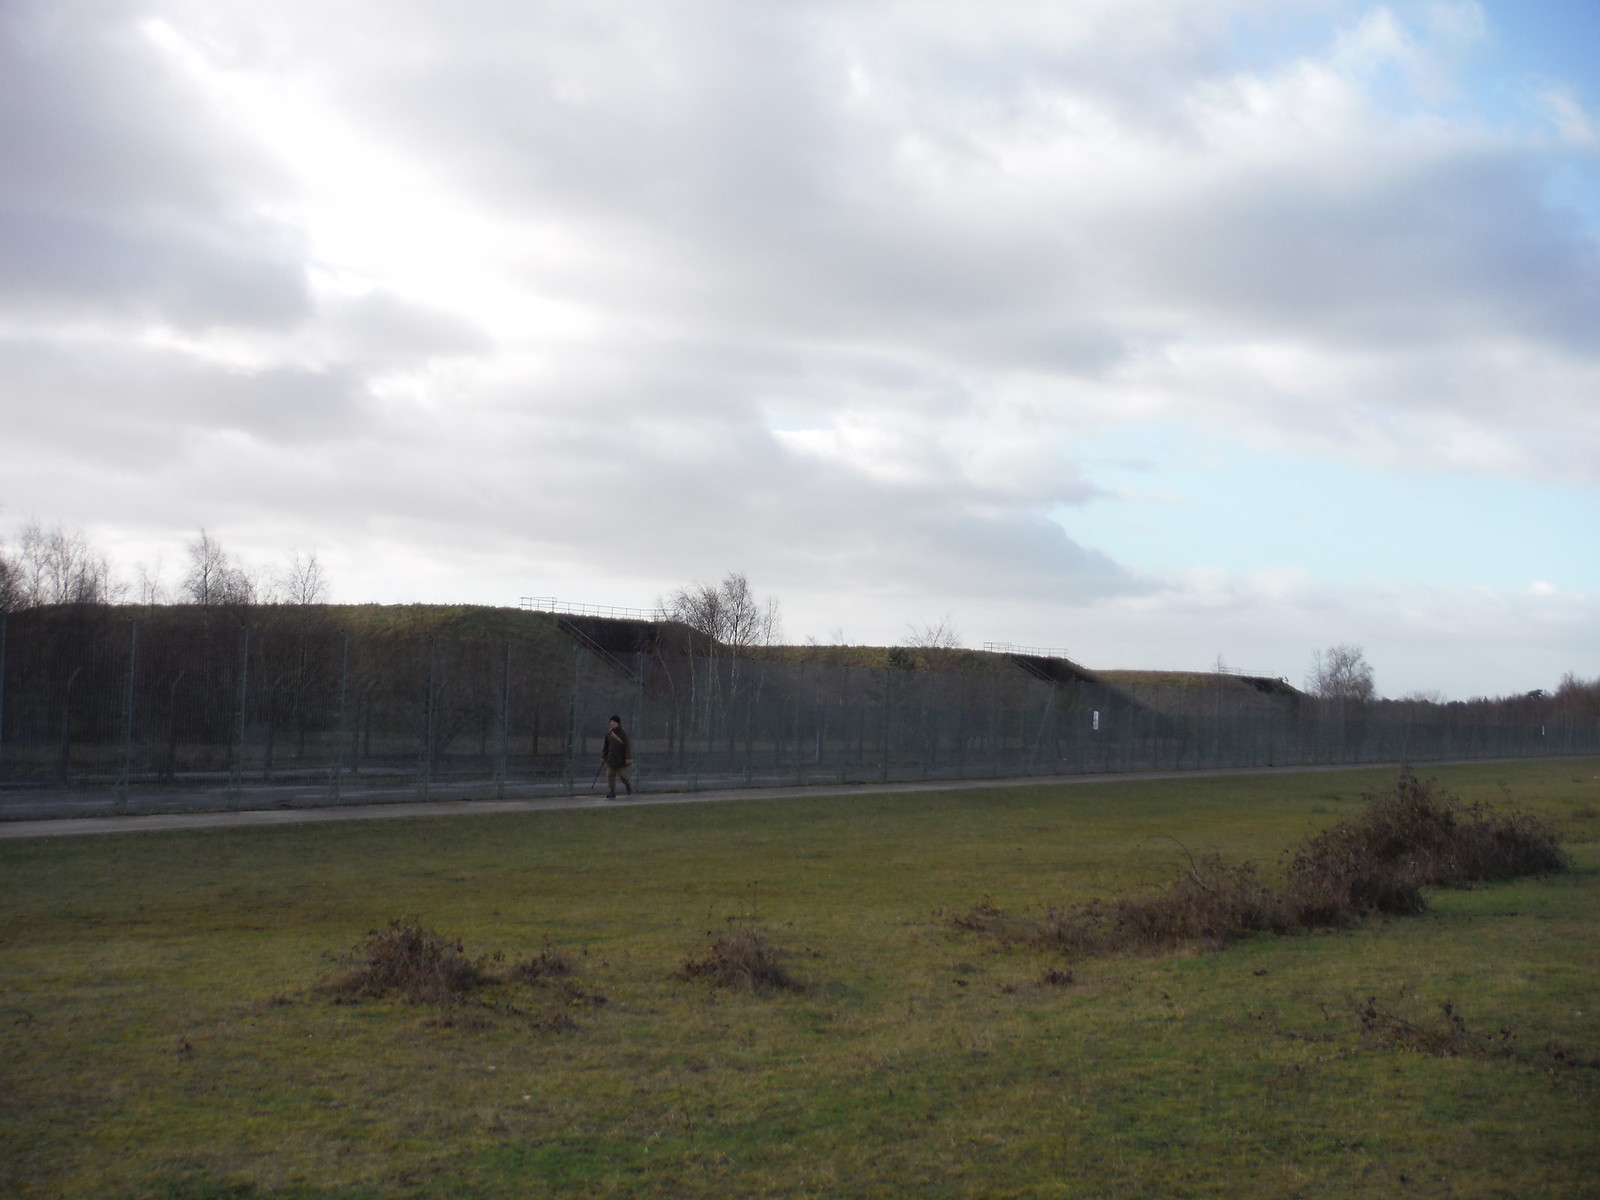 Greenham Common: Path along triple fence around missile bunker area SWC Walk 34 Newbury Racecourse to Woolhampton (Midgham Station)